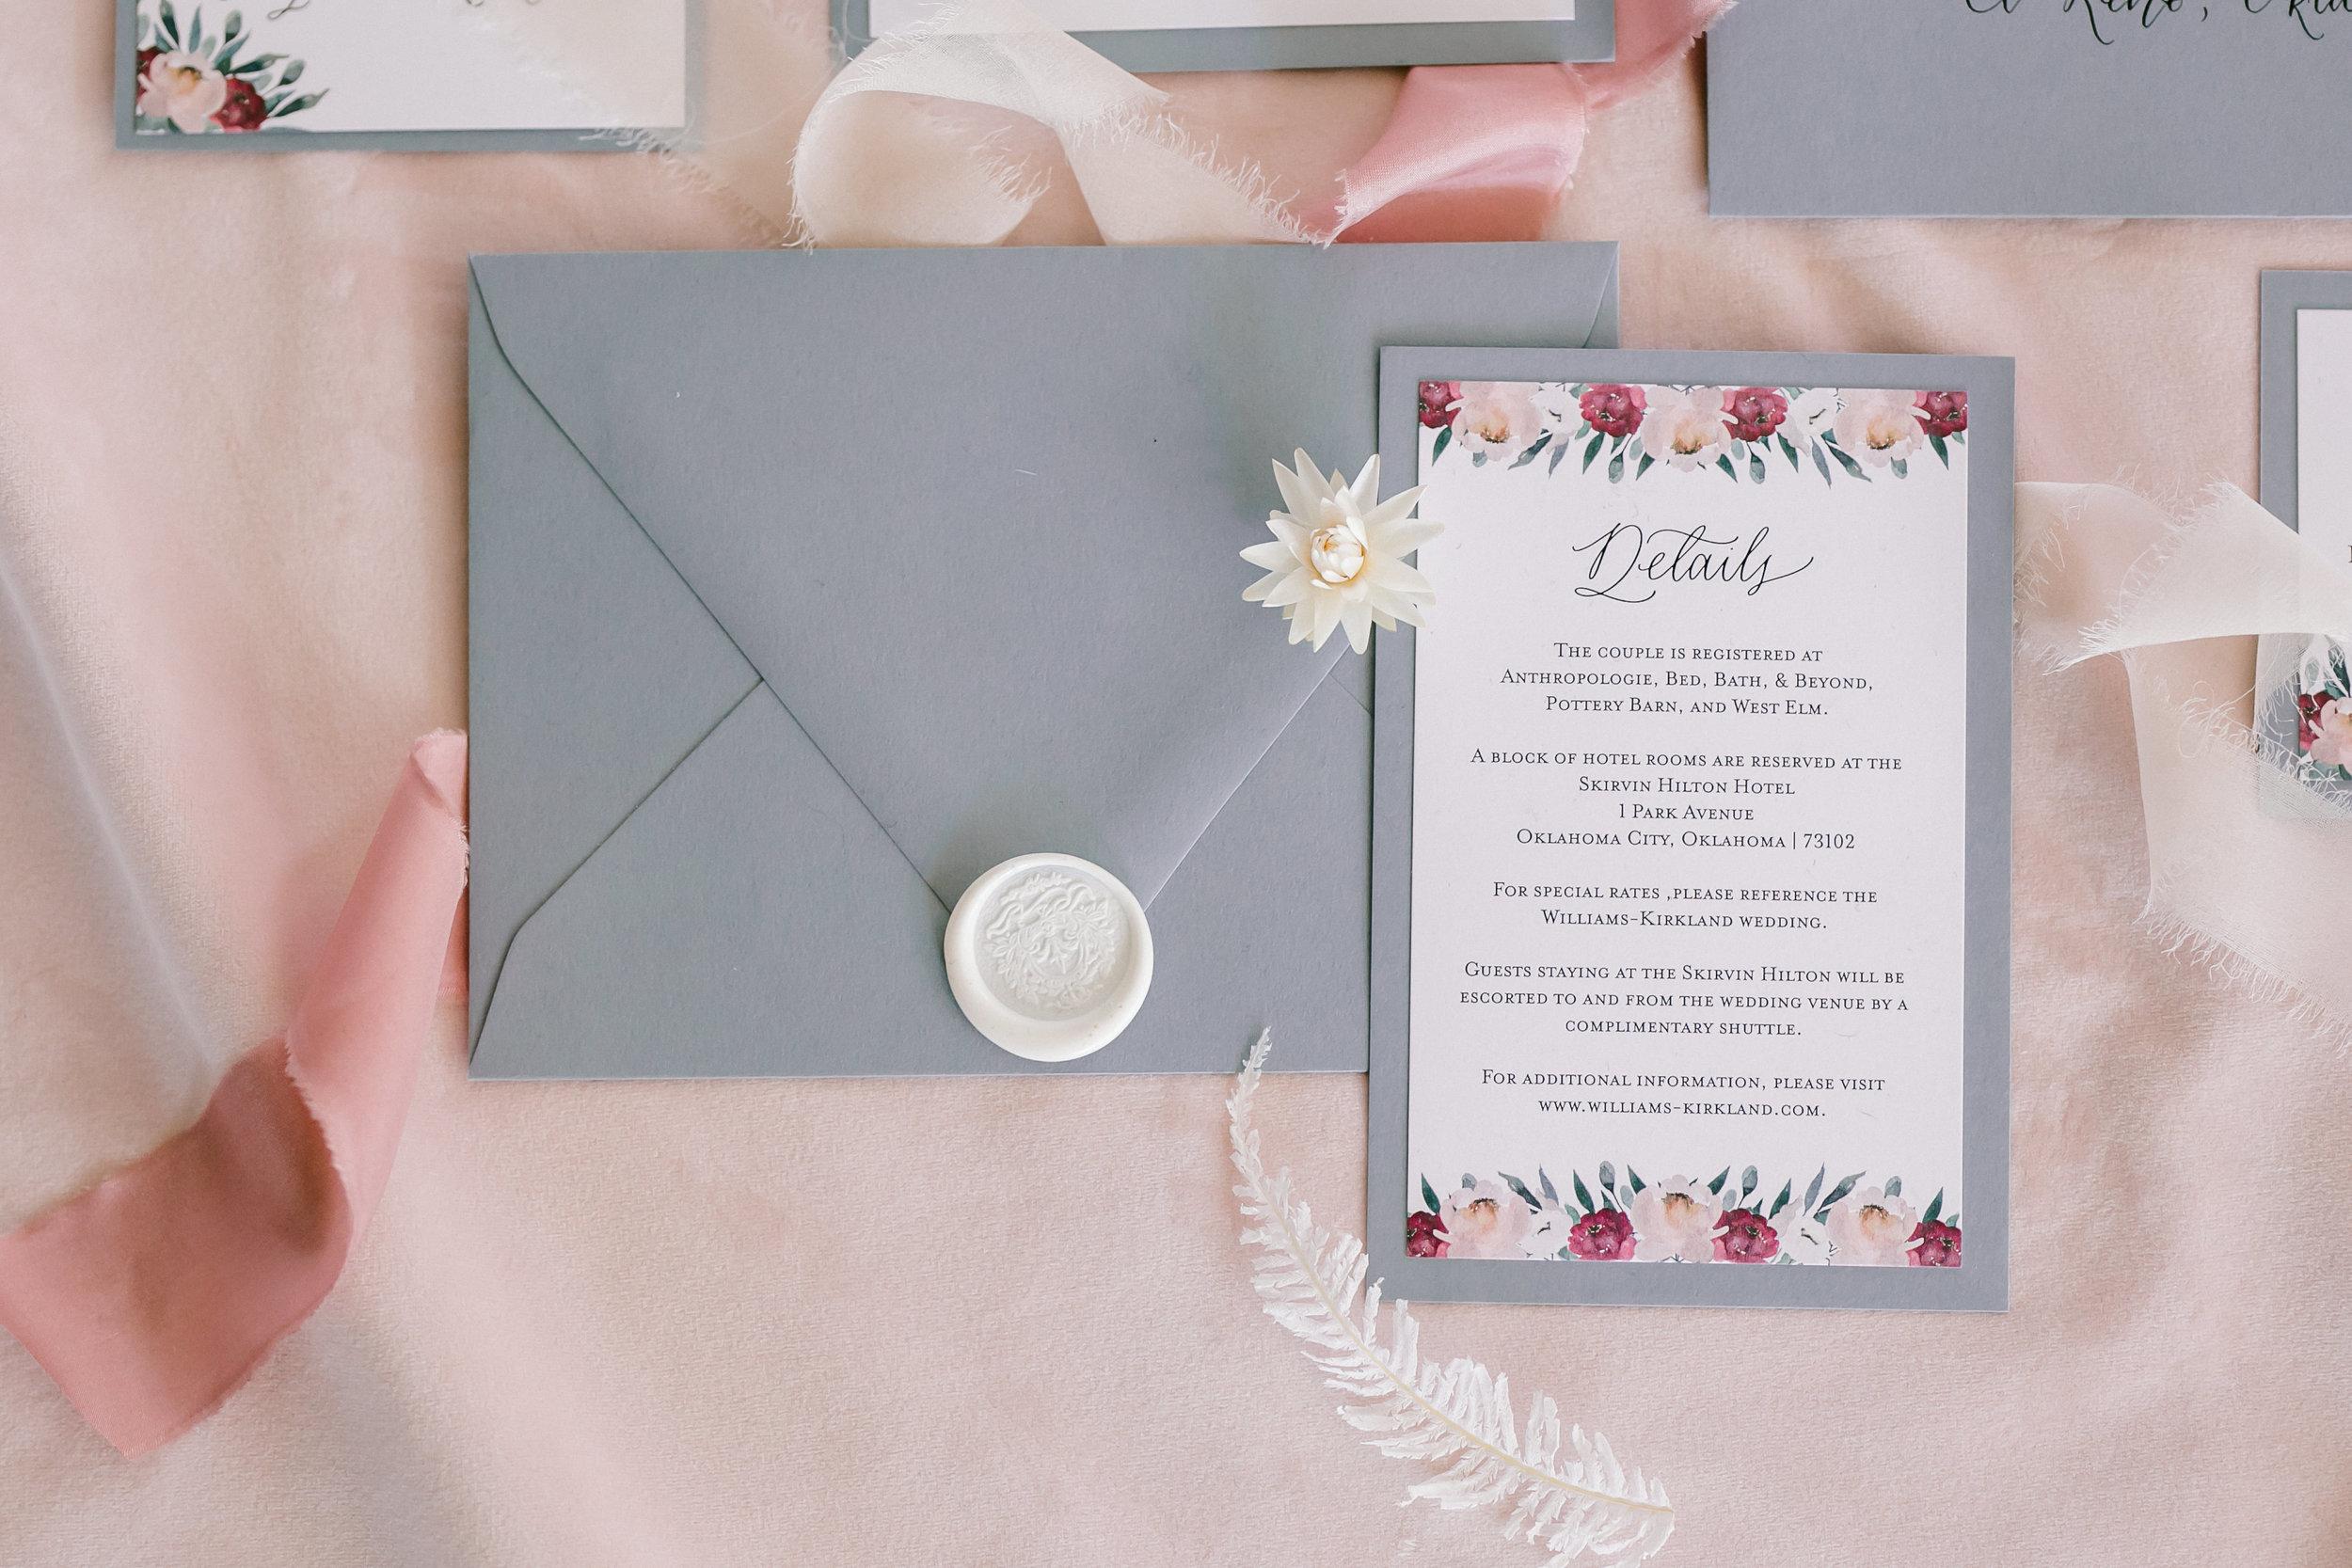 Festivities-Event-Center-Wedding-Oklahoma-City-Wedding-Photographer-Emily-Nicole-Photo-180.jpg